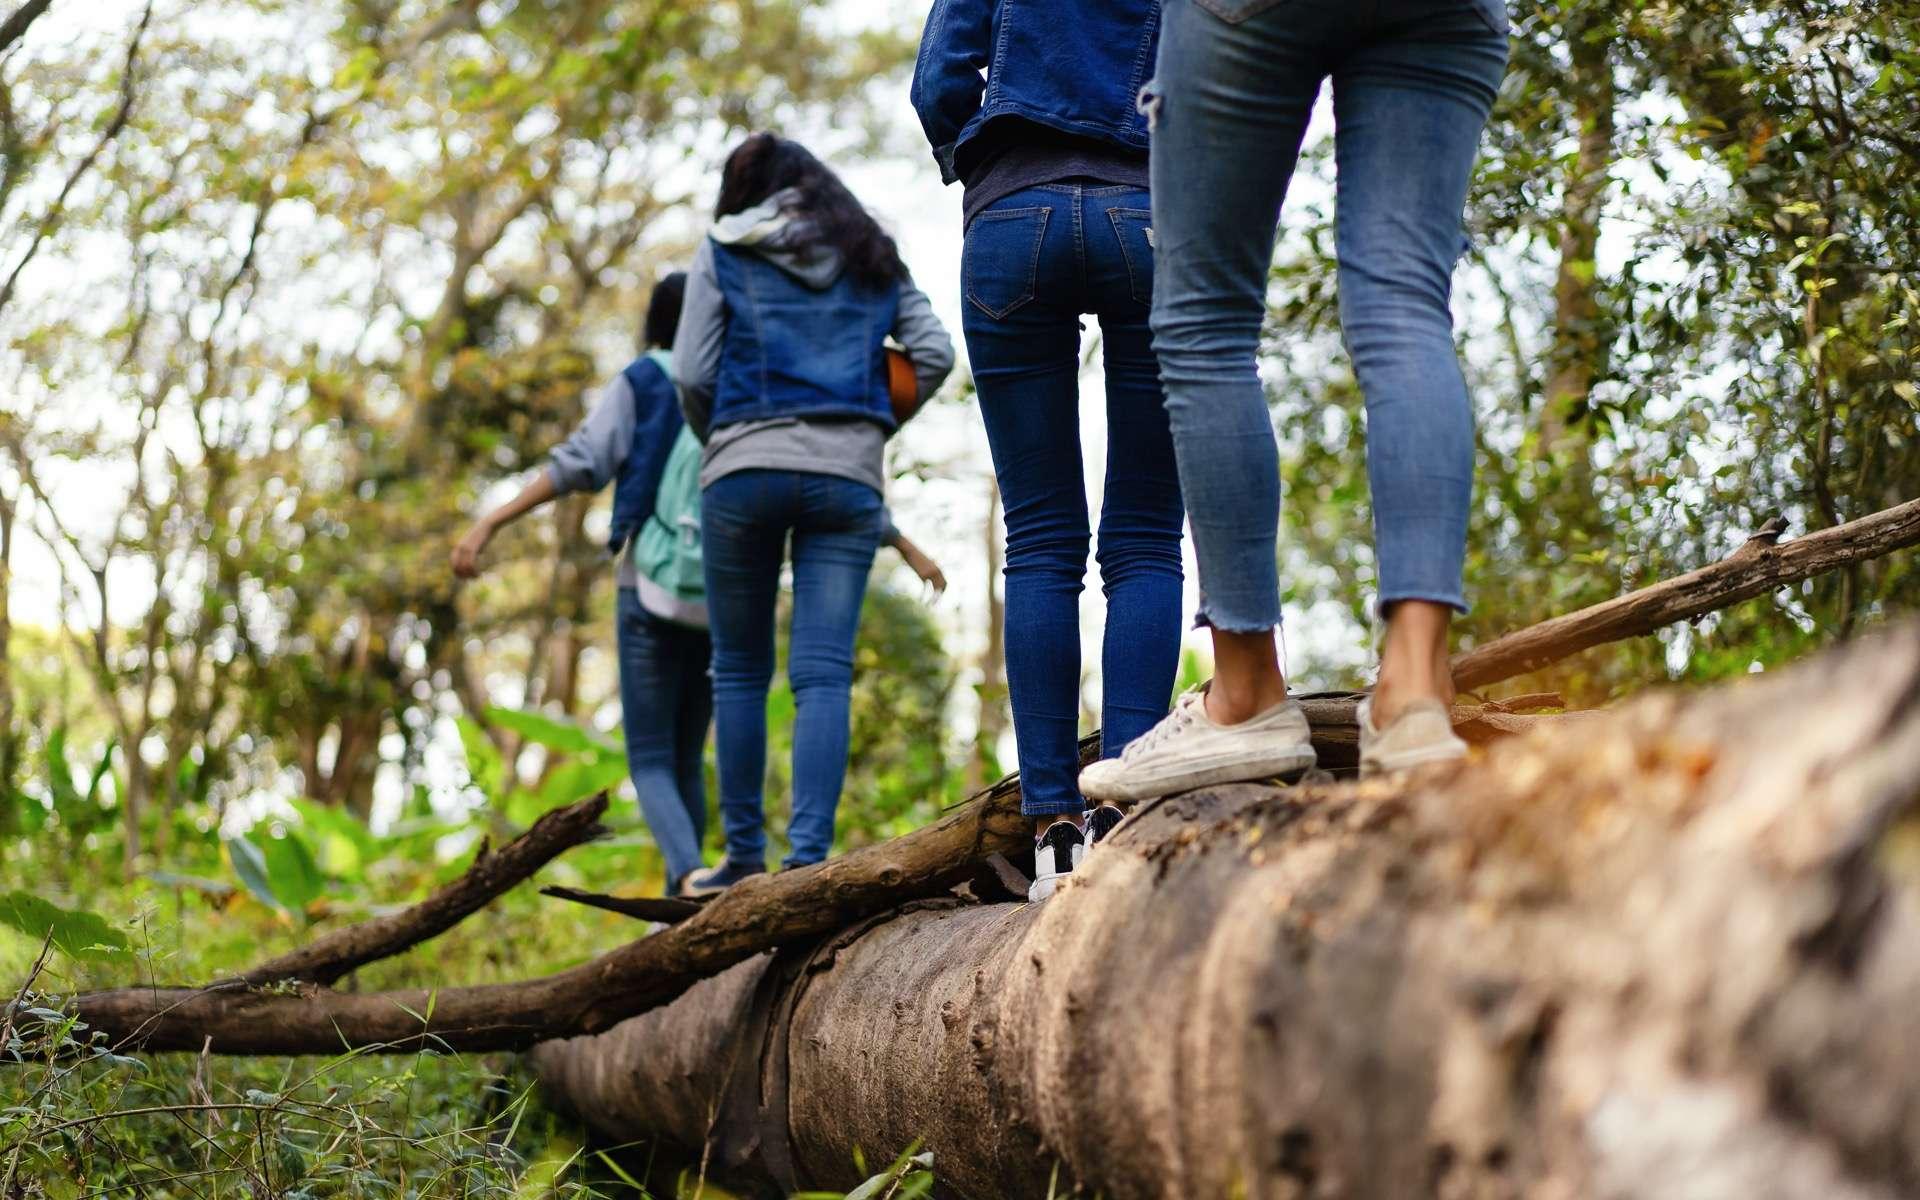 Dix minutes de promenade dans la nature réduit le stress. © Foto2u, Adobe Stock